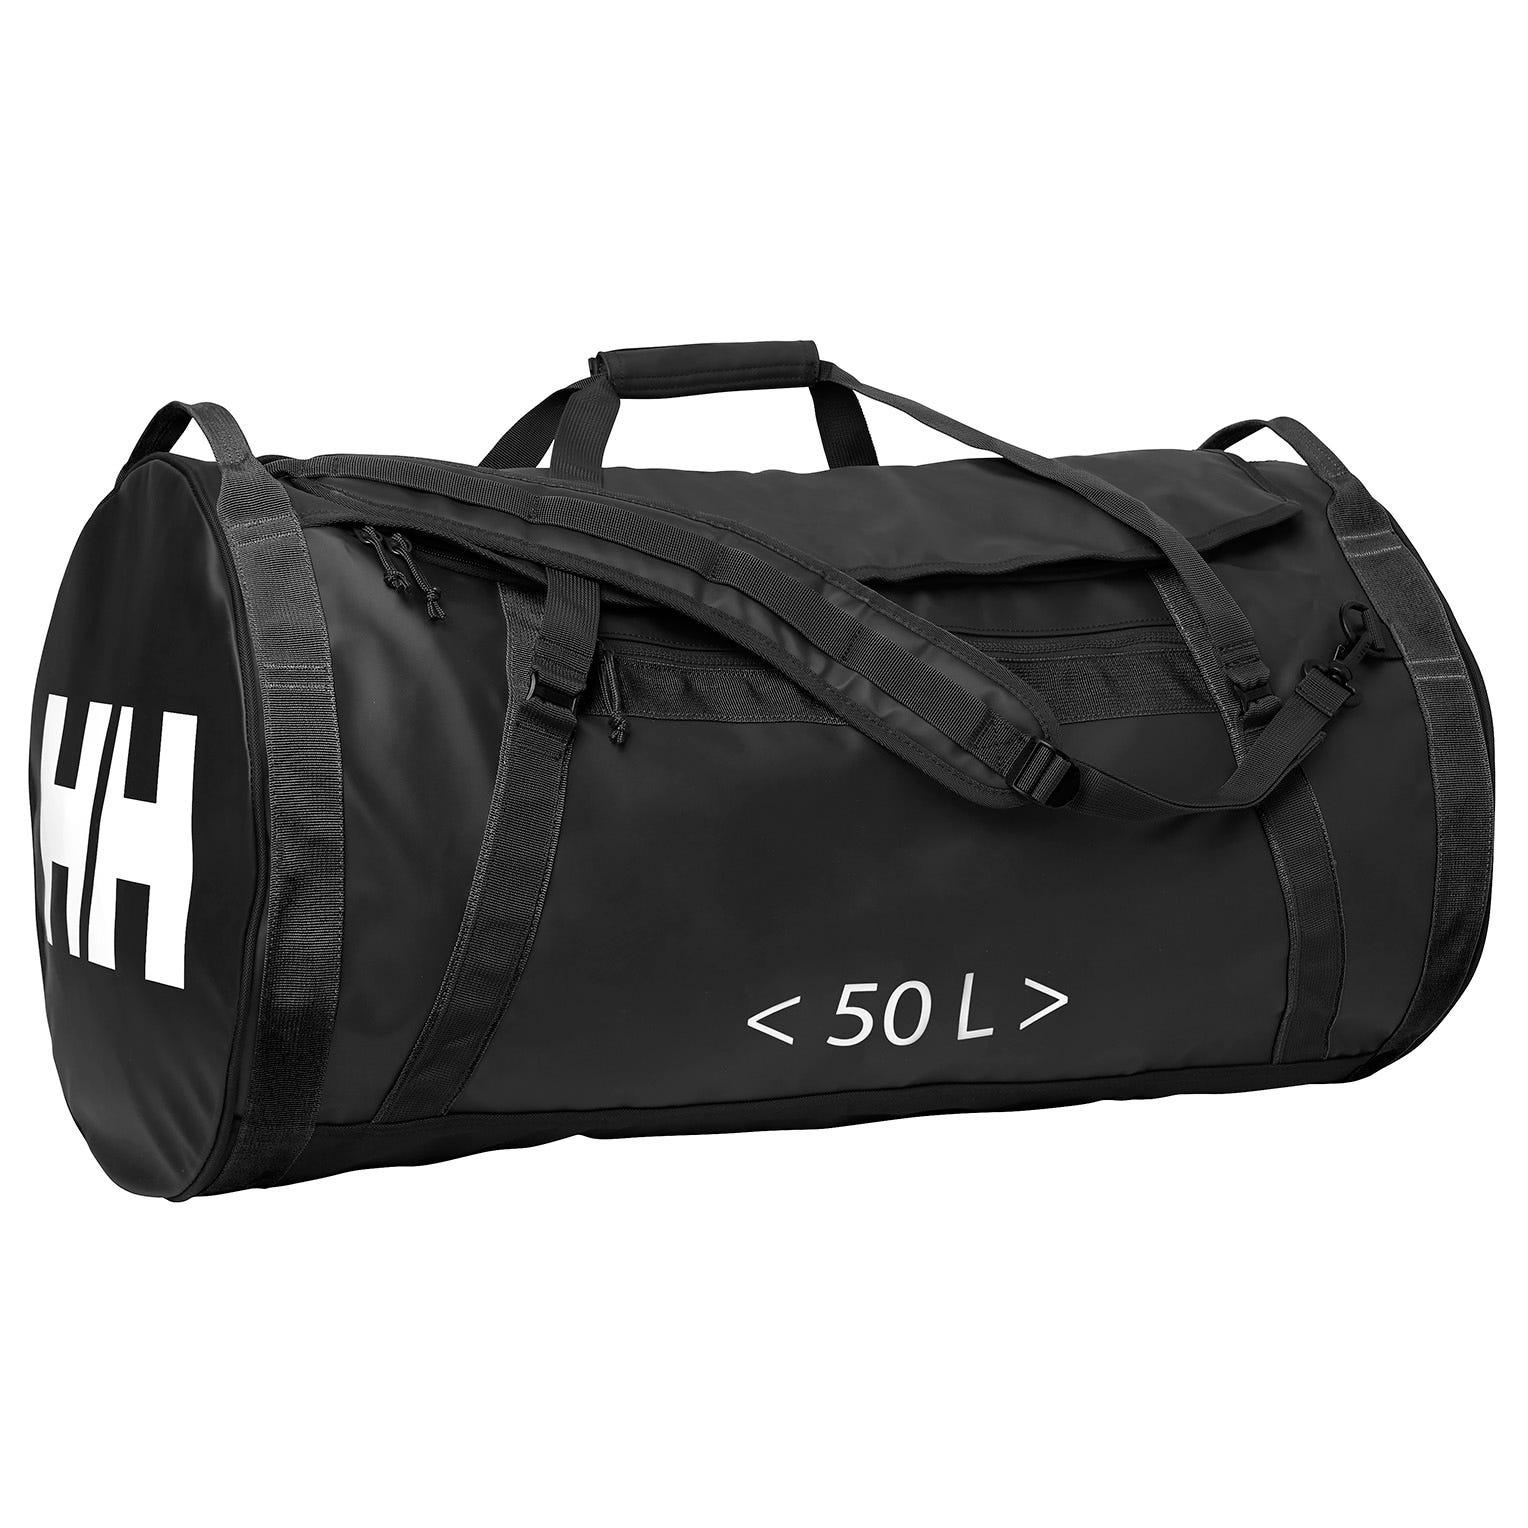 Helly Hansen Duffelbag 2 50l Svart STD